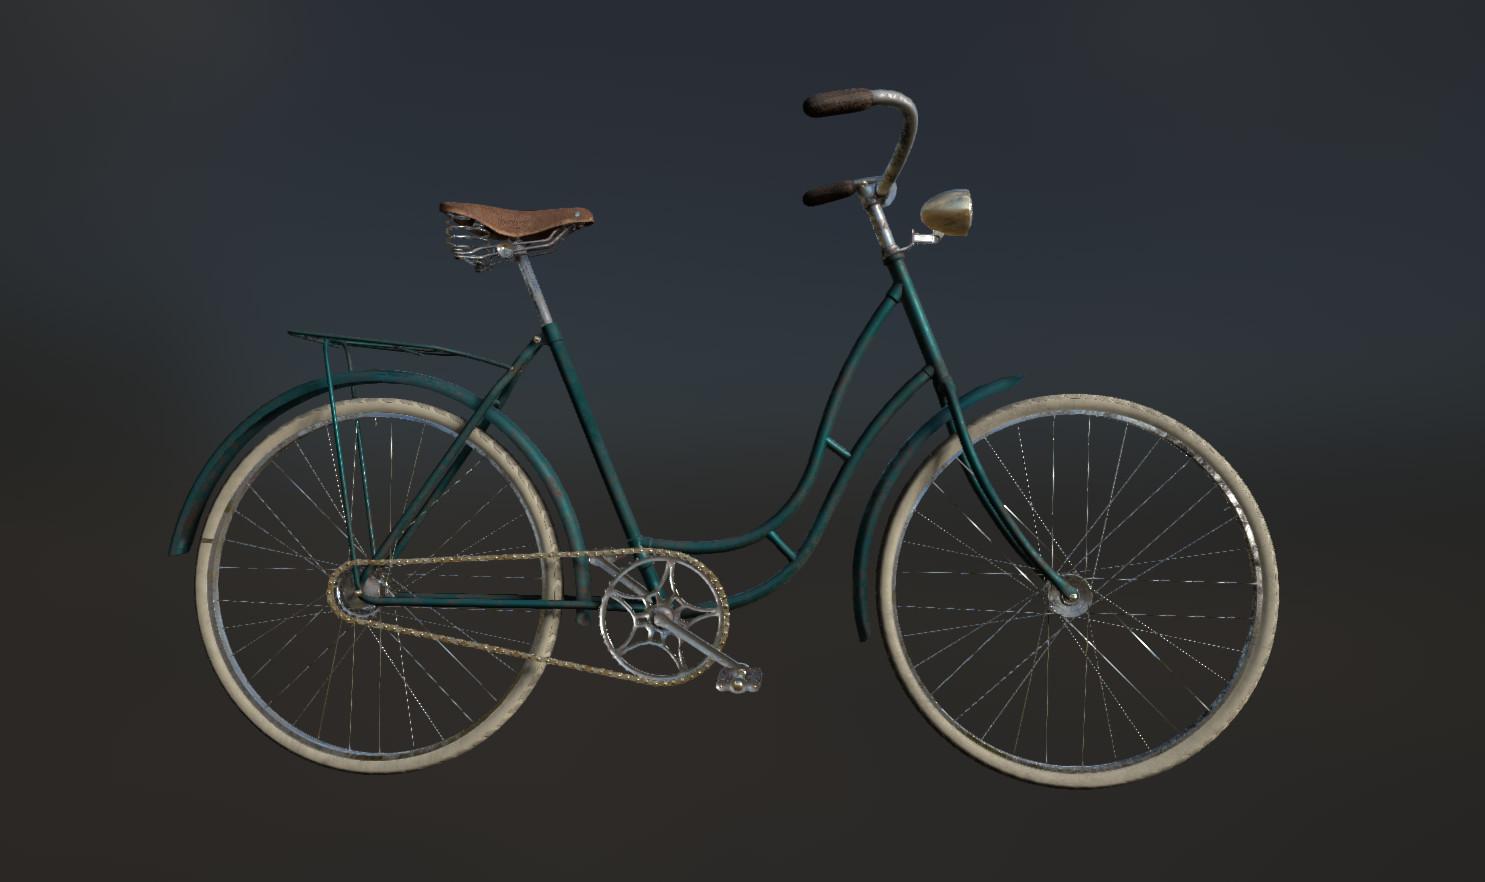 Litha bacchi bike02